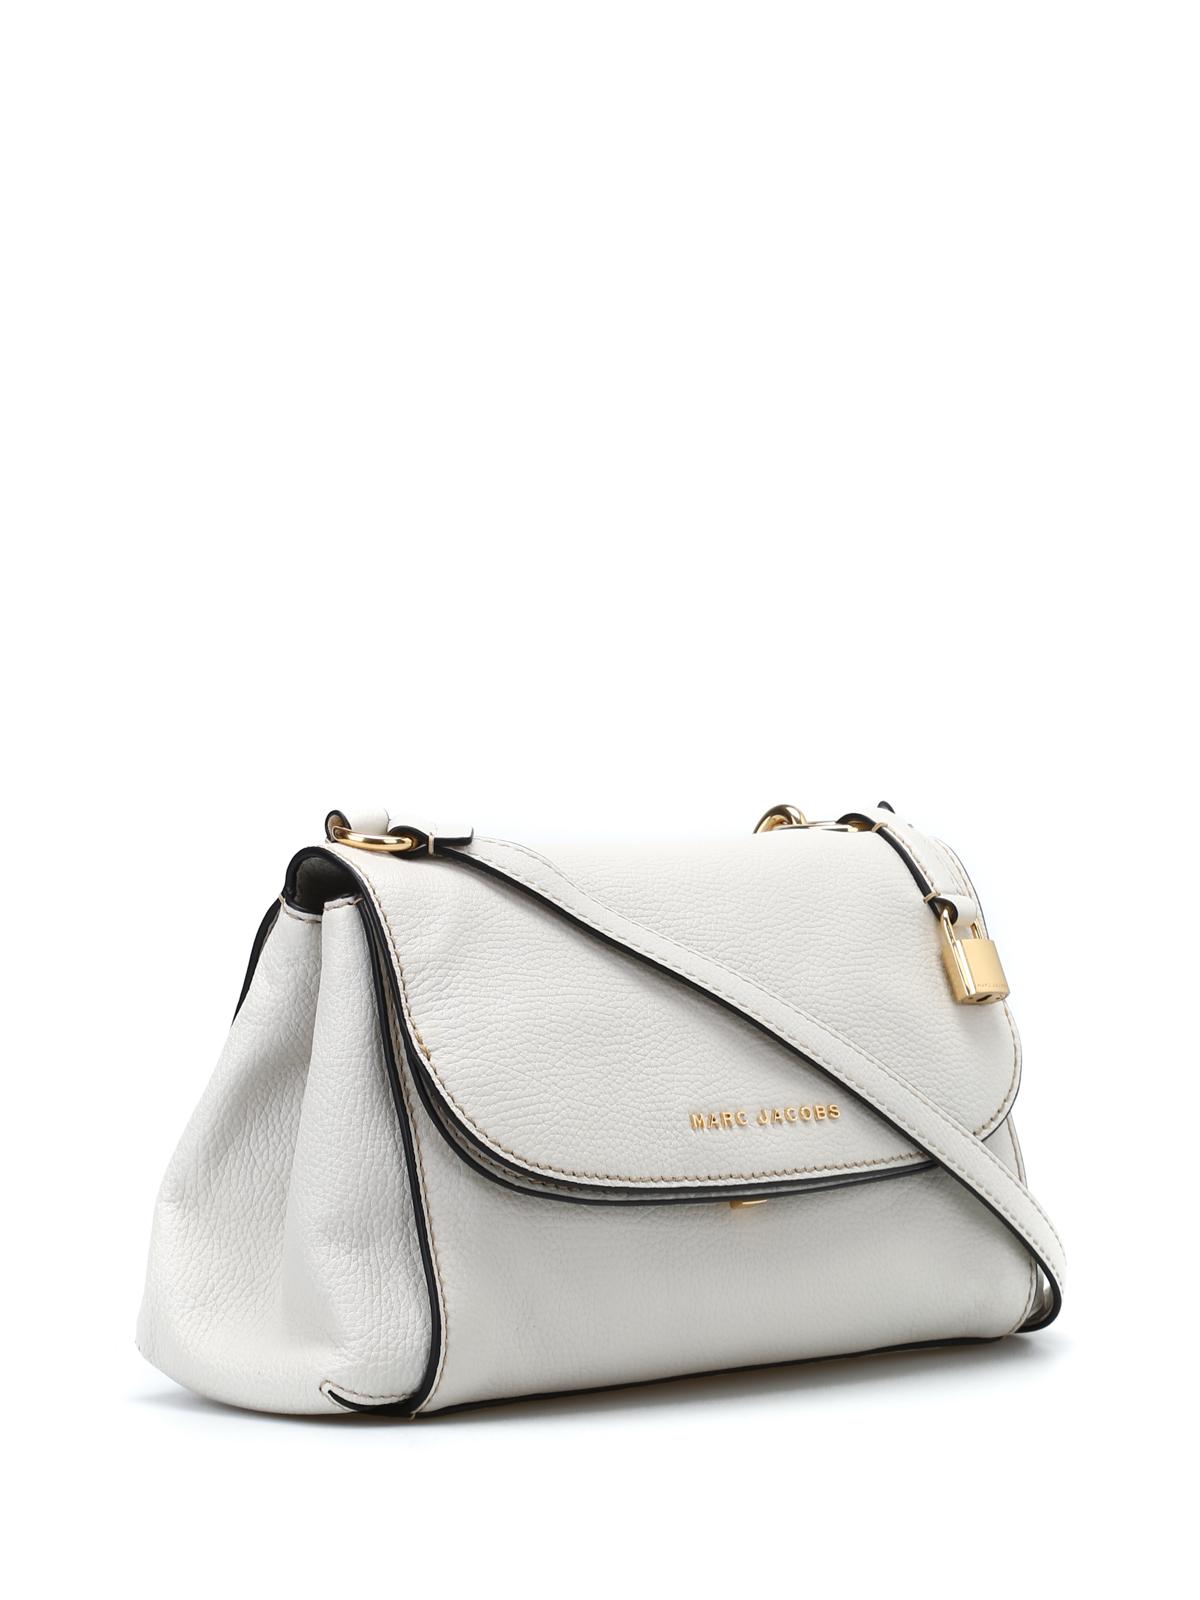 b43e6b4b6ff MARC JACOBS: shoulder bags online - Boho Grind grainy leather bag